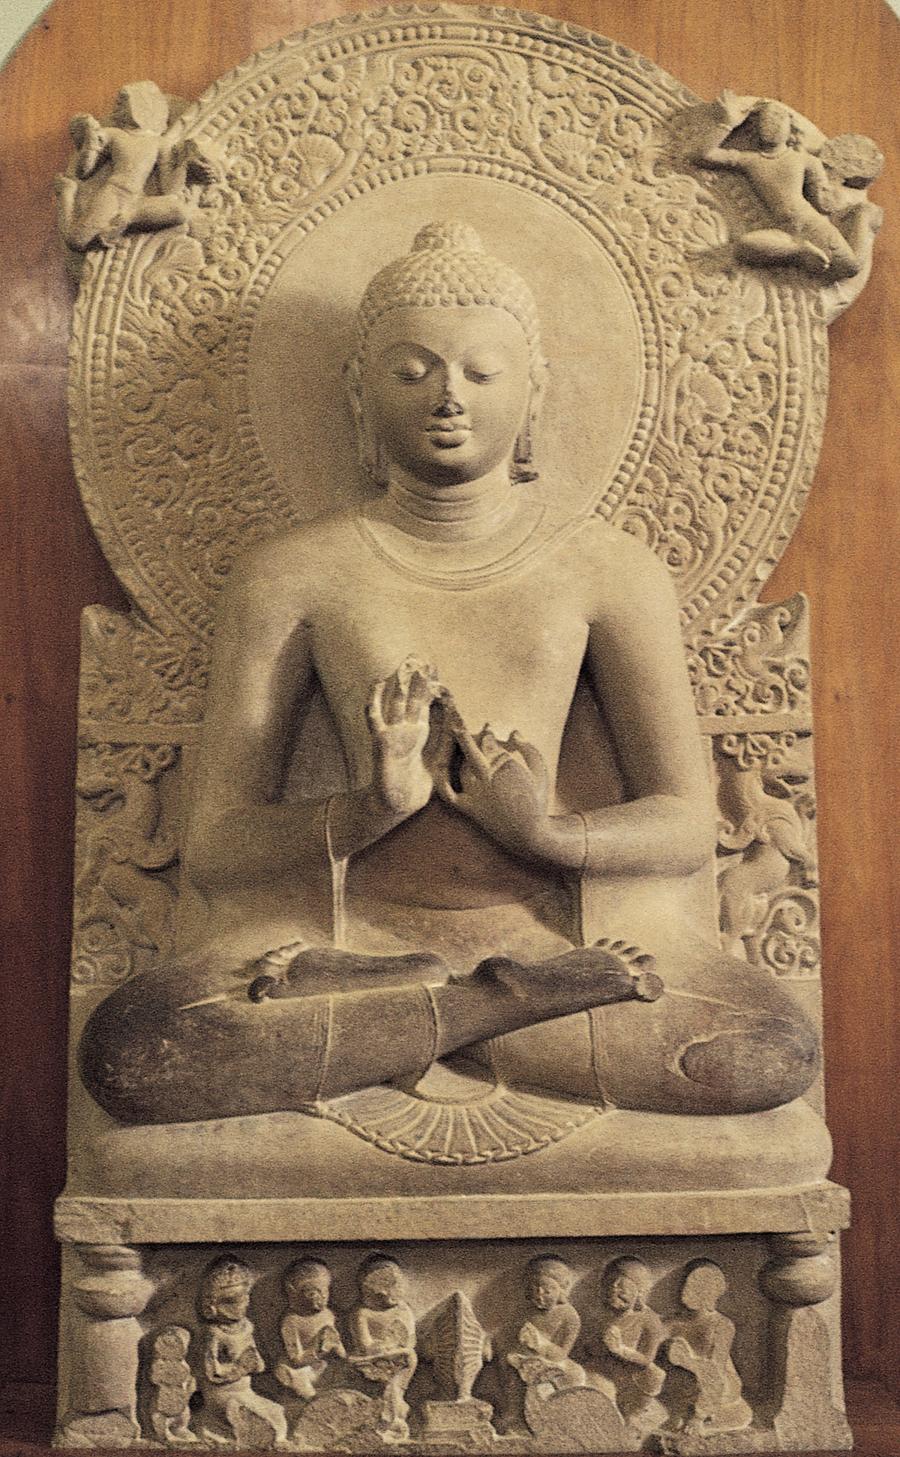 2. Buda de Sarnath